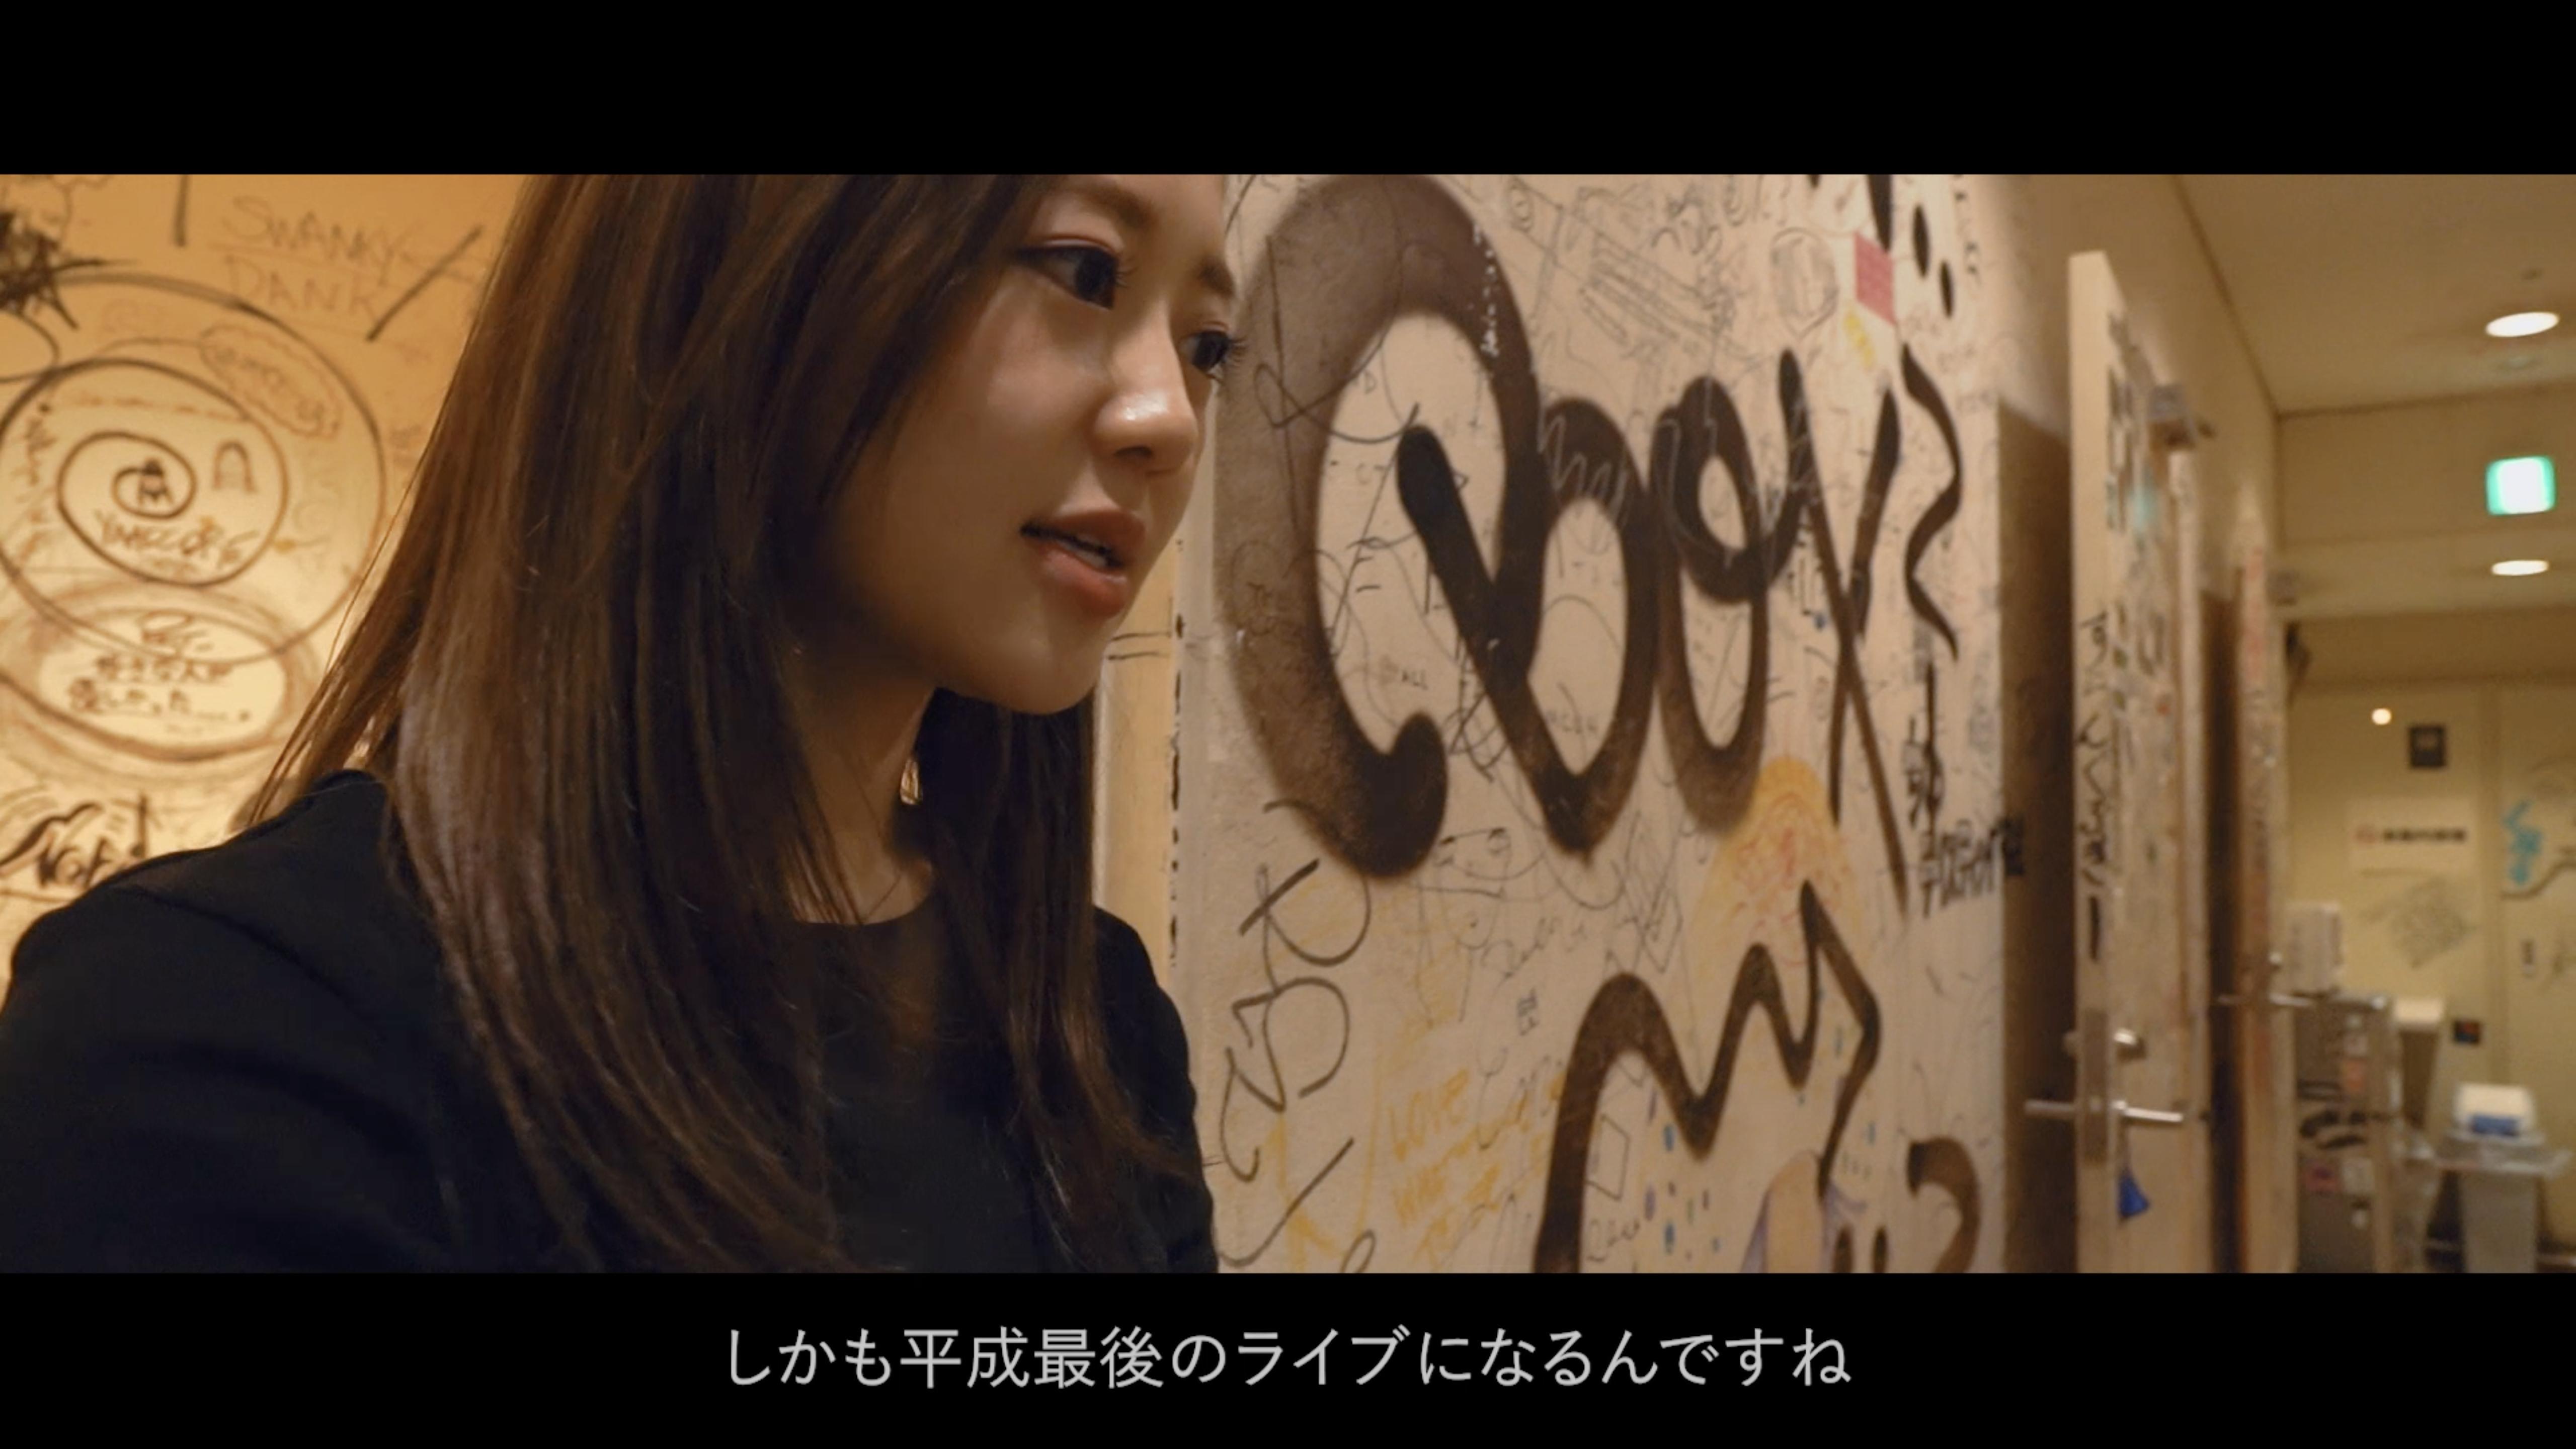 hy4_4yh(ハイパーヨーヨ)ドキュメンタリー第9話 最終回 画像05